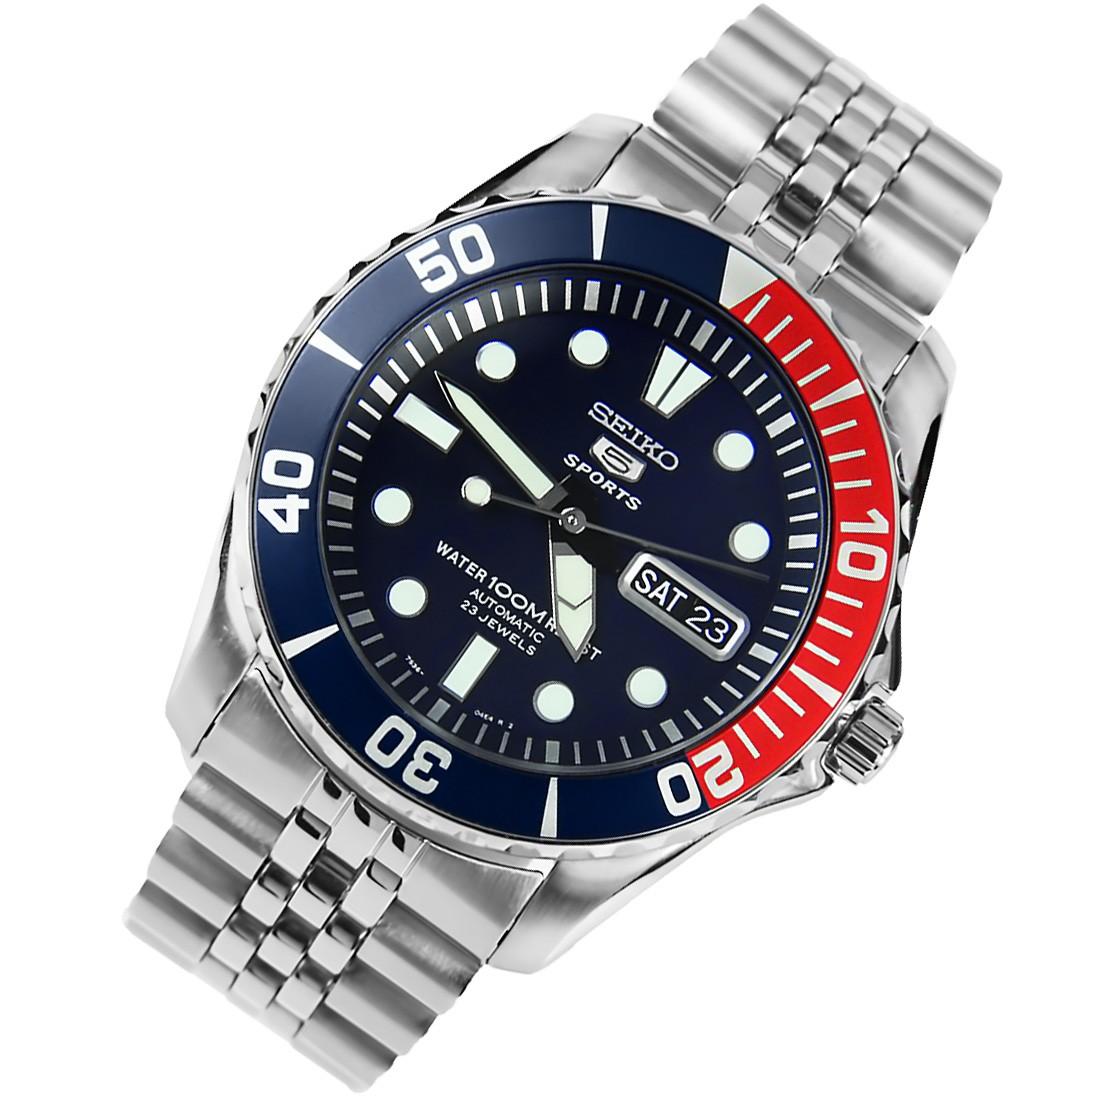 Đồng hồ Seiko SNZF15K1 (4)